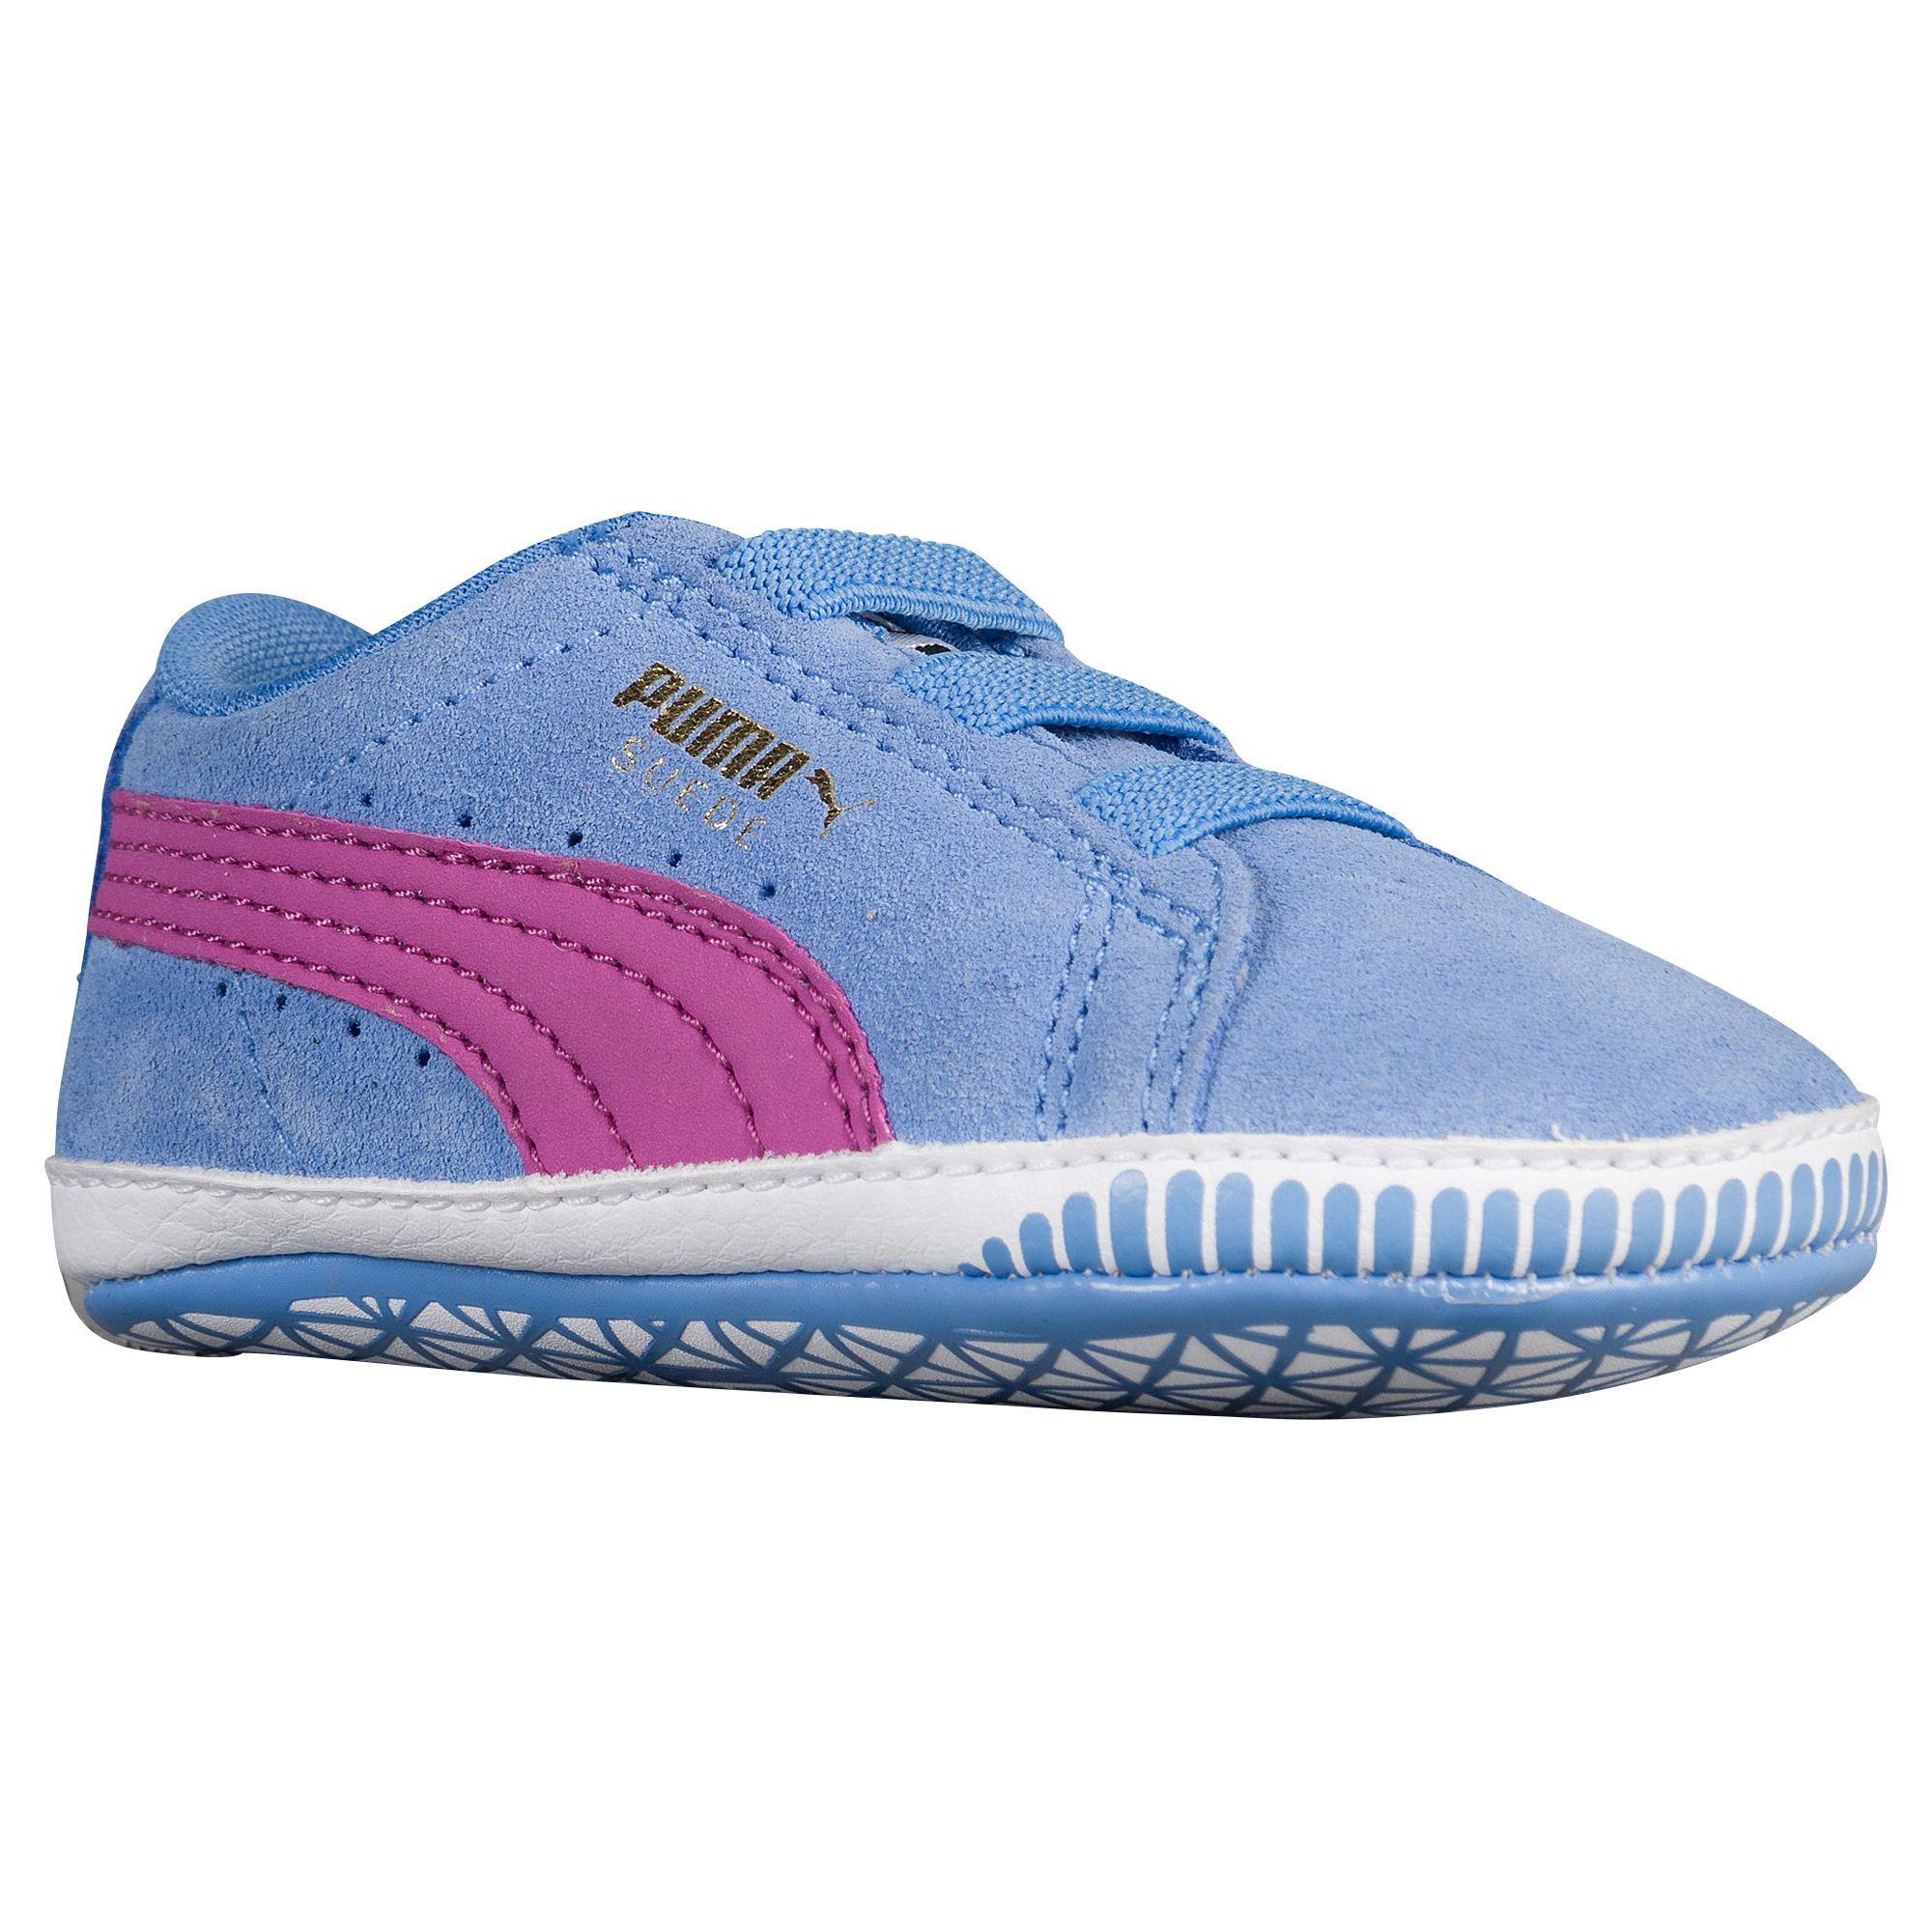 958b45131730 PUMA Suede Crib - Girls  Infant - Basketball - Shoes - Marina Blue Meadow  Mauve